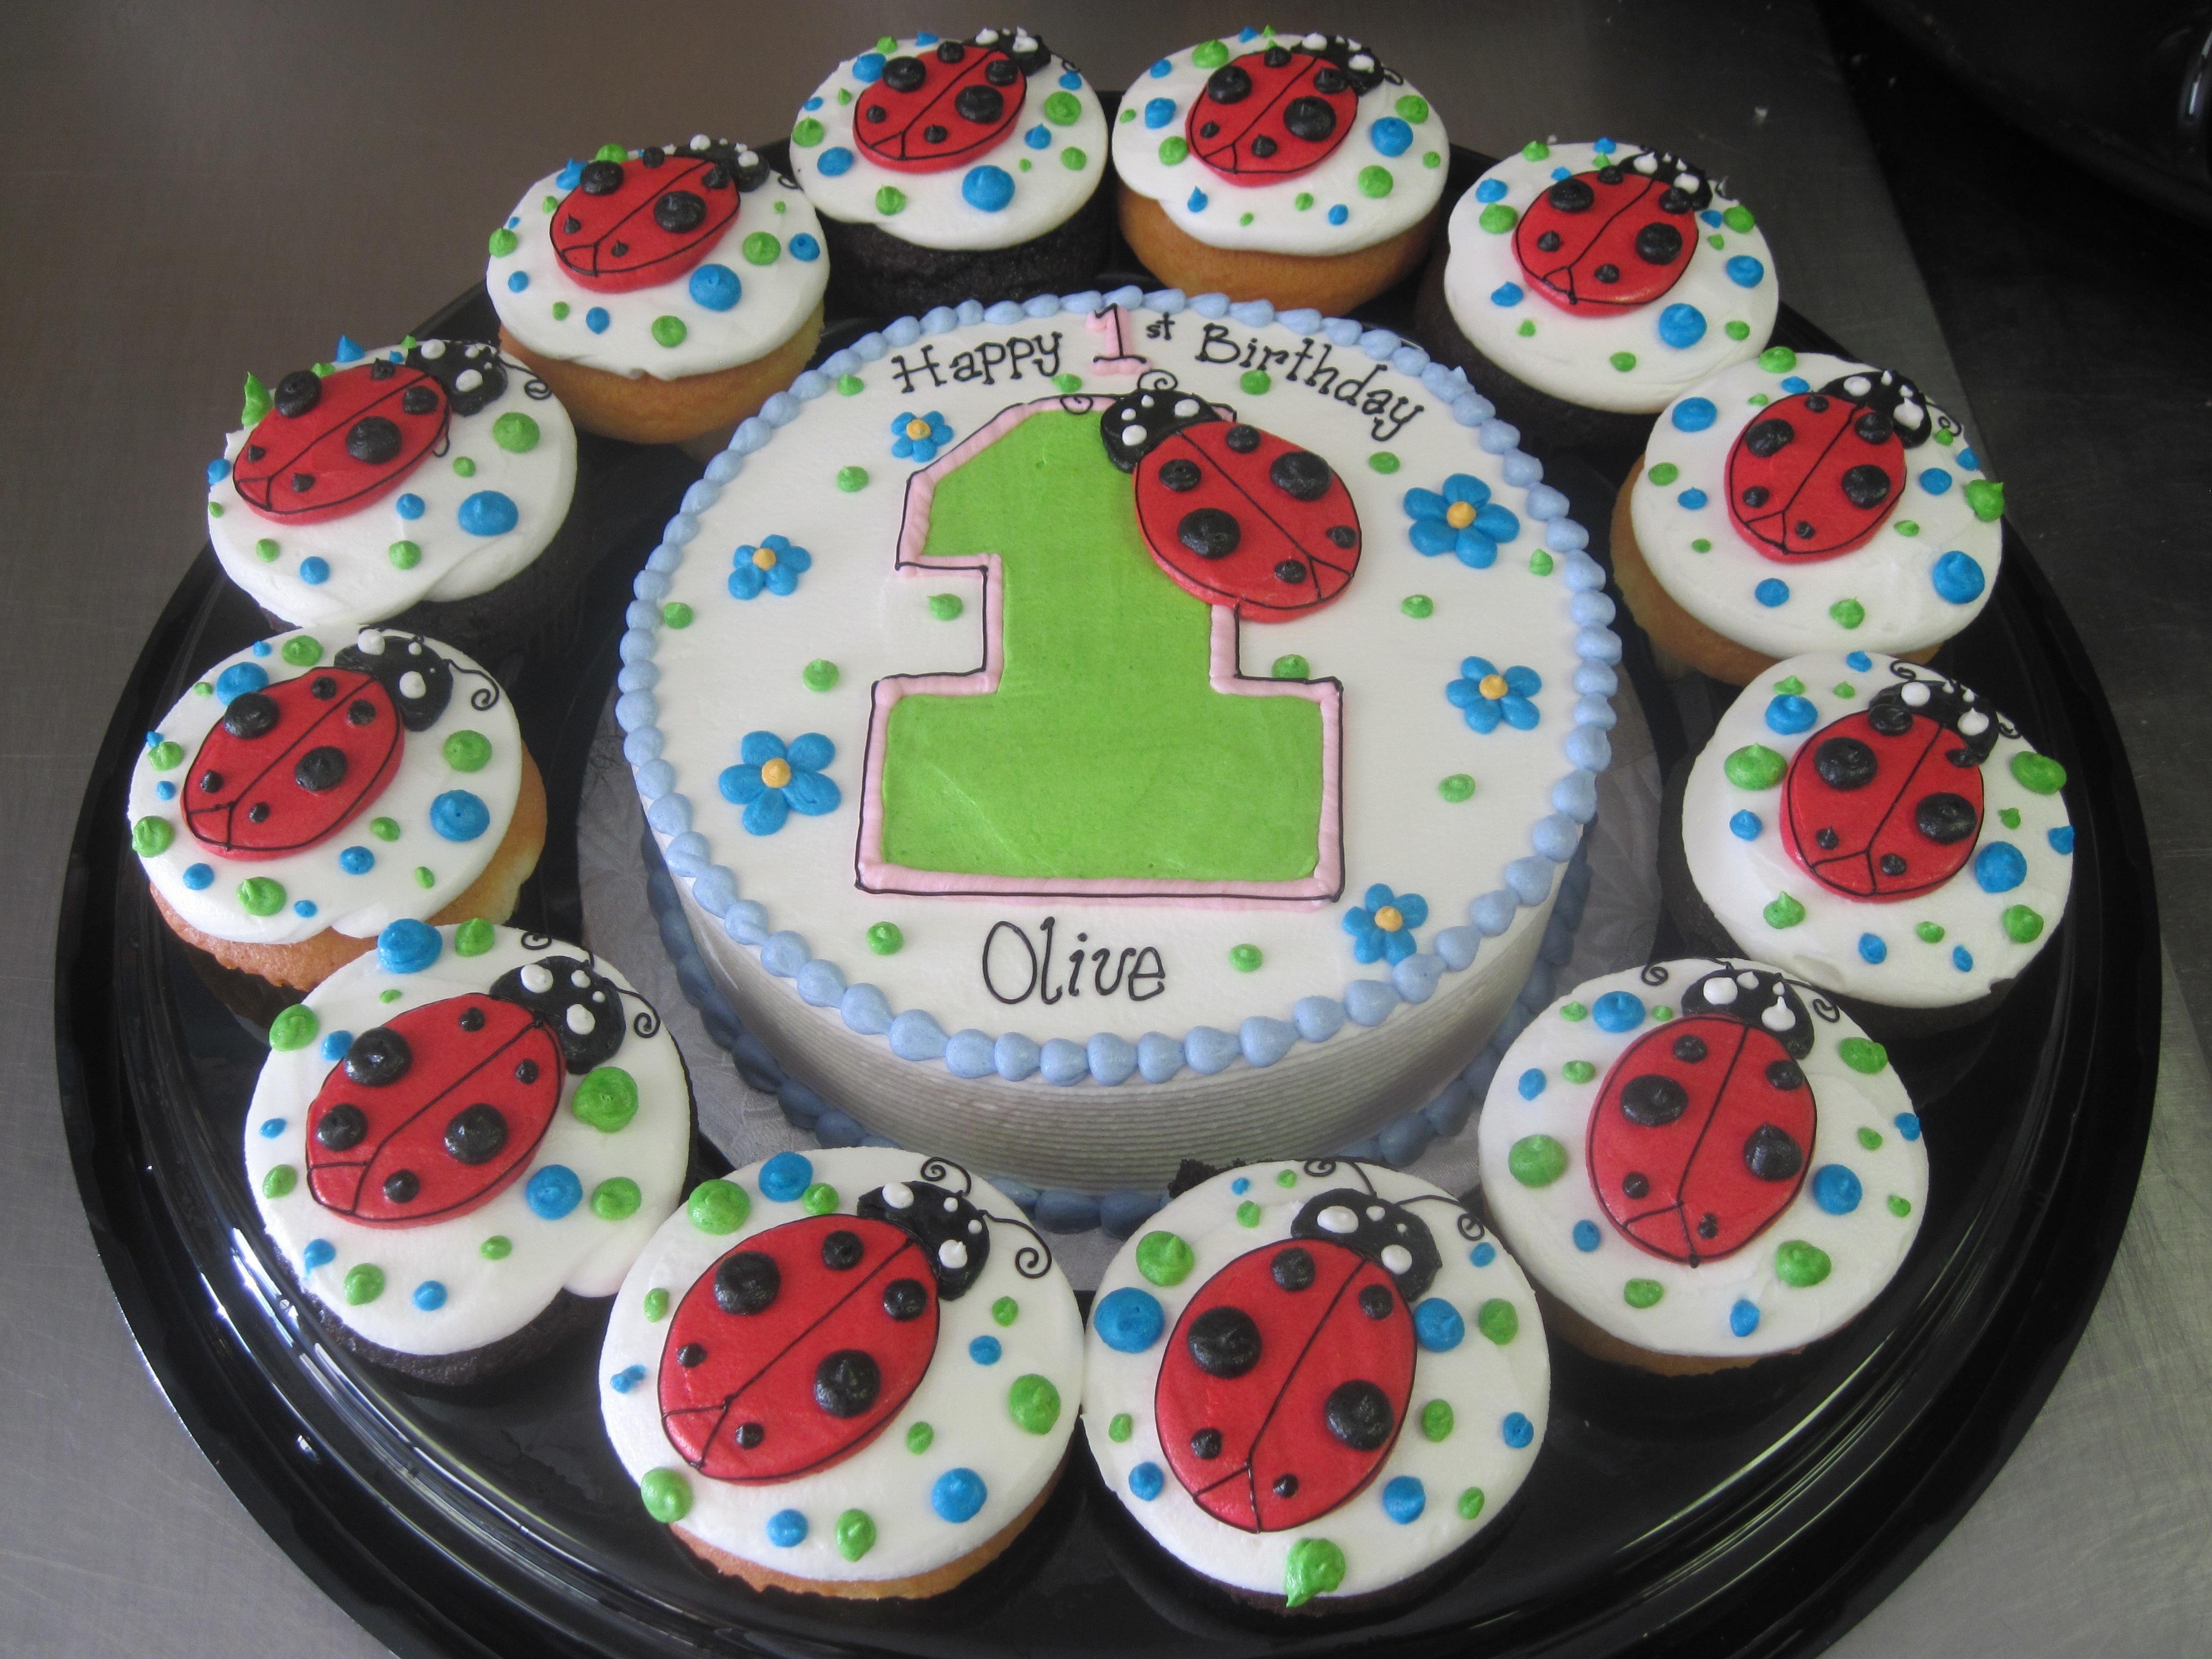 Cupcakes Cakeworks Blog - Bug cupcake decorating ideas